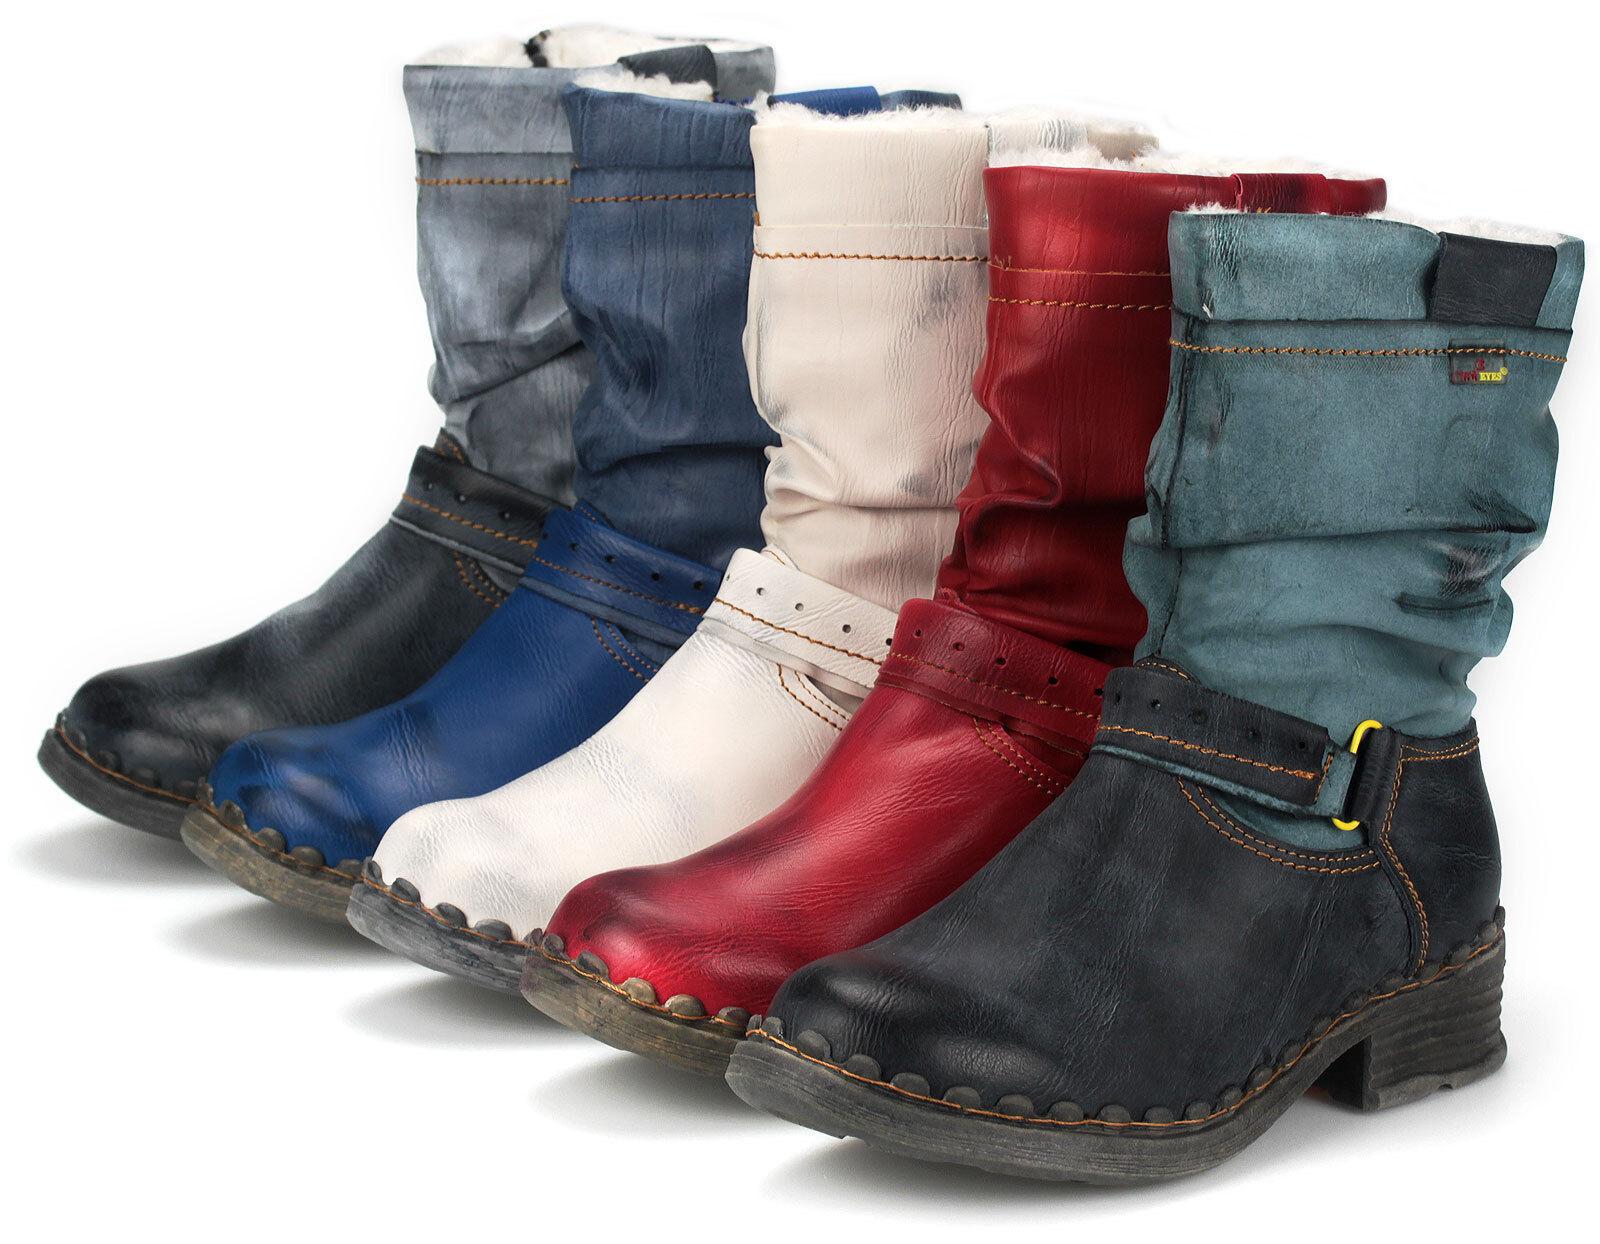 TMA Damen Winter Stiefel Stiefel Gefüttert Winterstiefel Damenschuhe Neu 5005